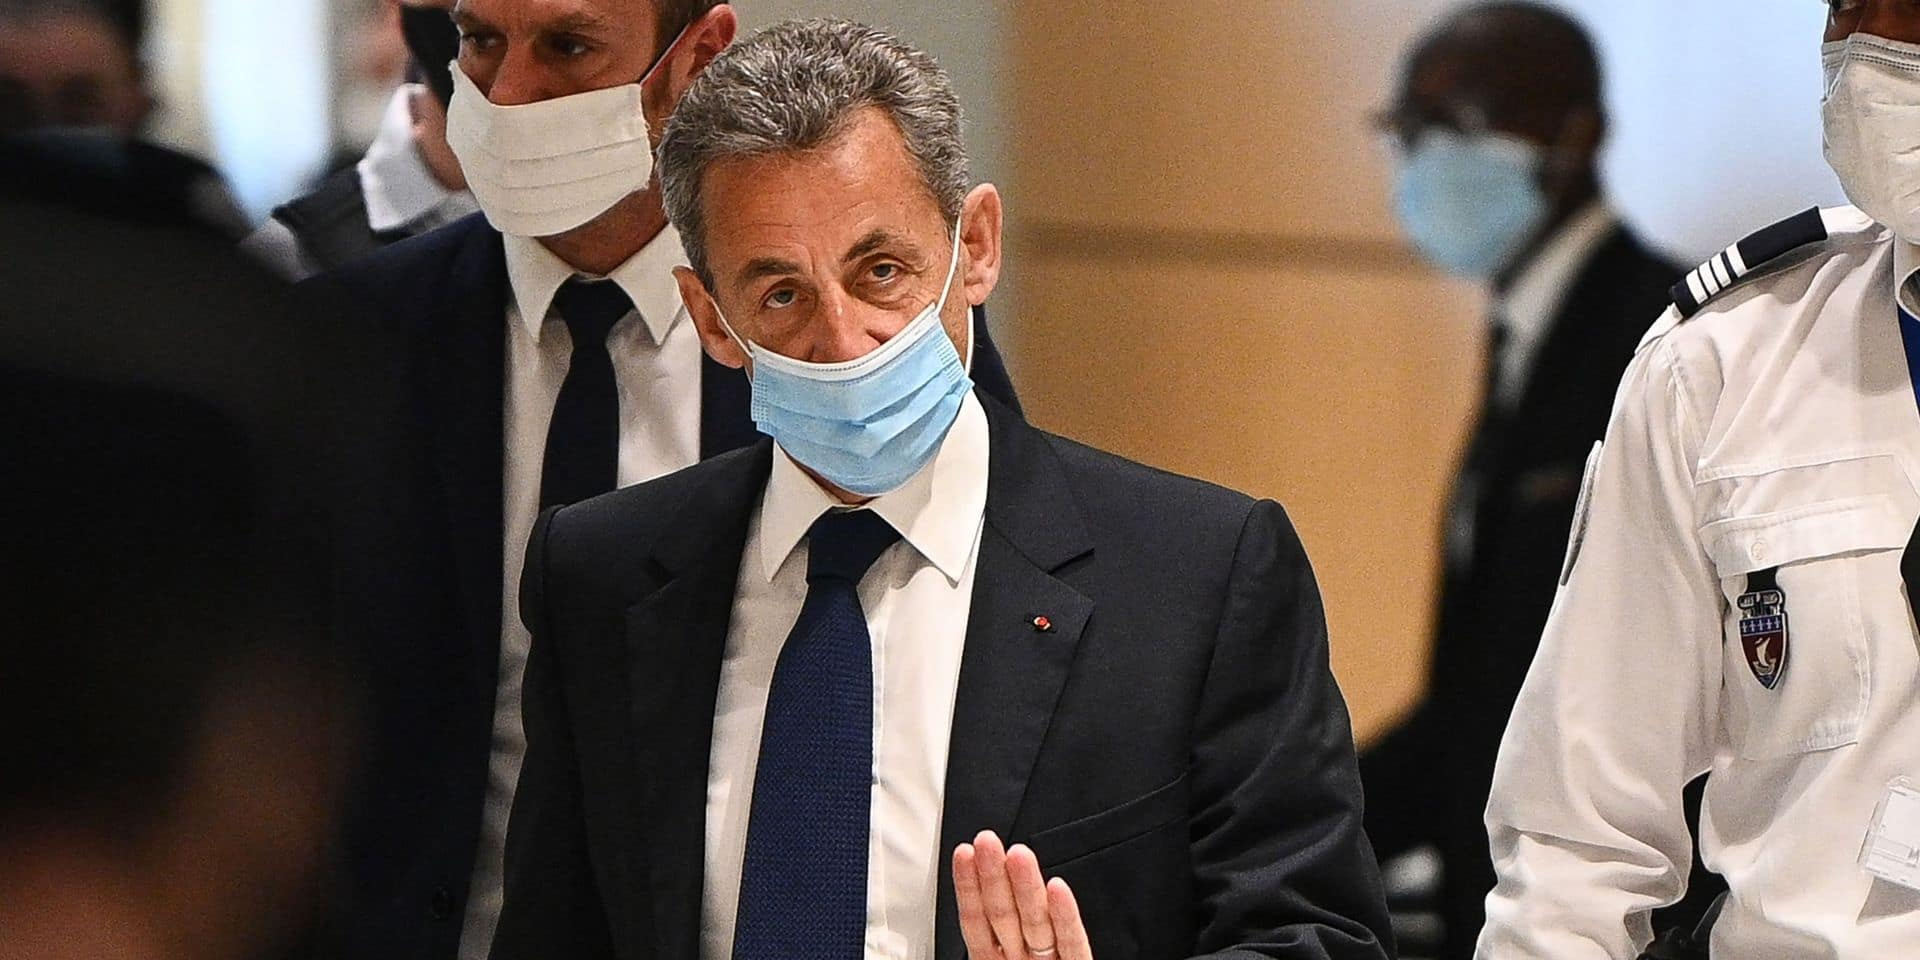 Procès Bygmalion: Nicolas Sarkozy interrogé le 15 juin